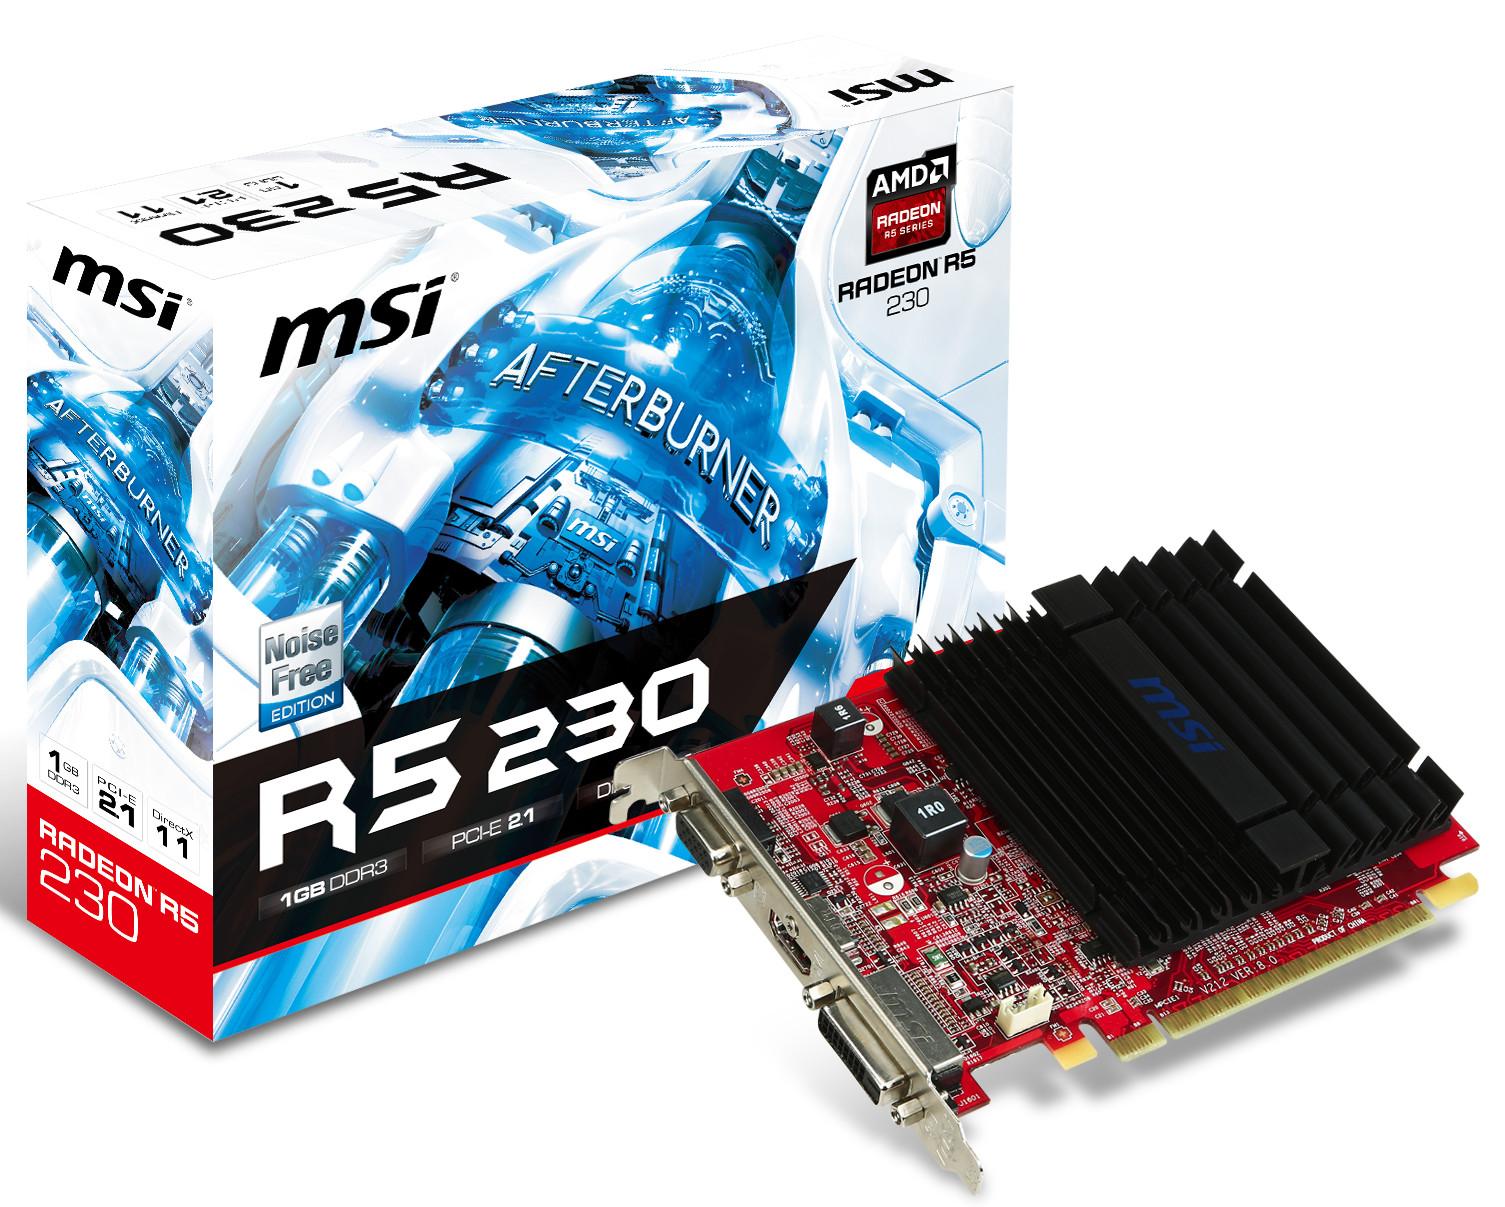 Radeon R5 230 (модель: R5230-1GD3H)